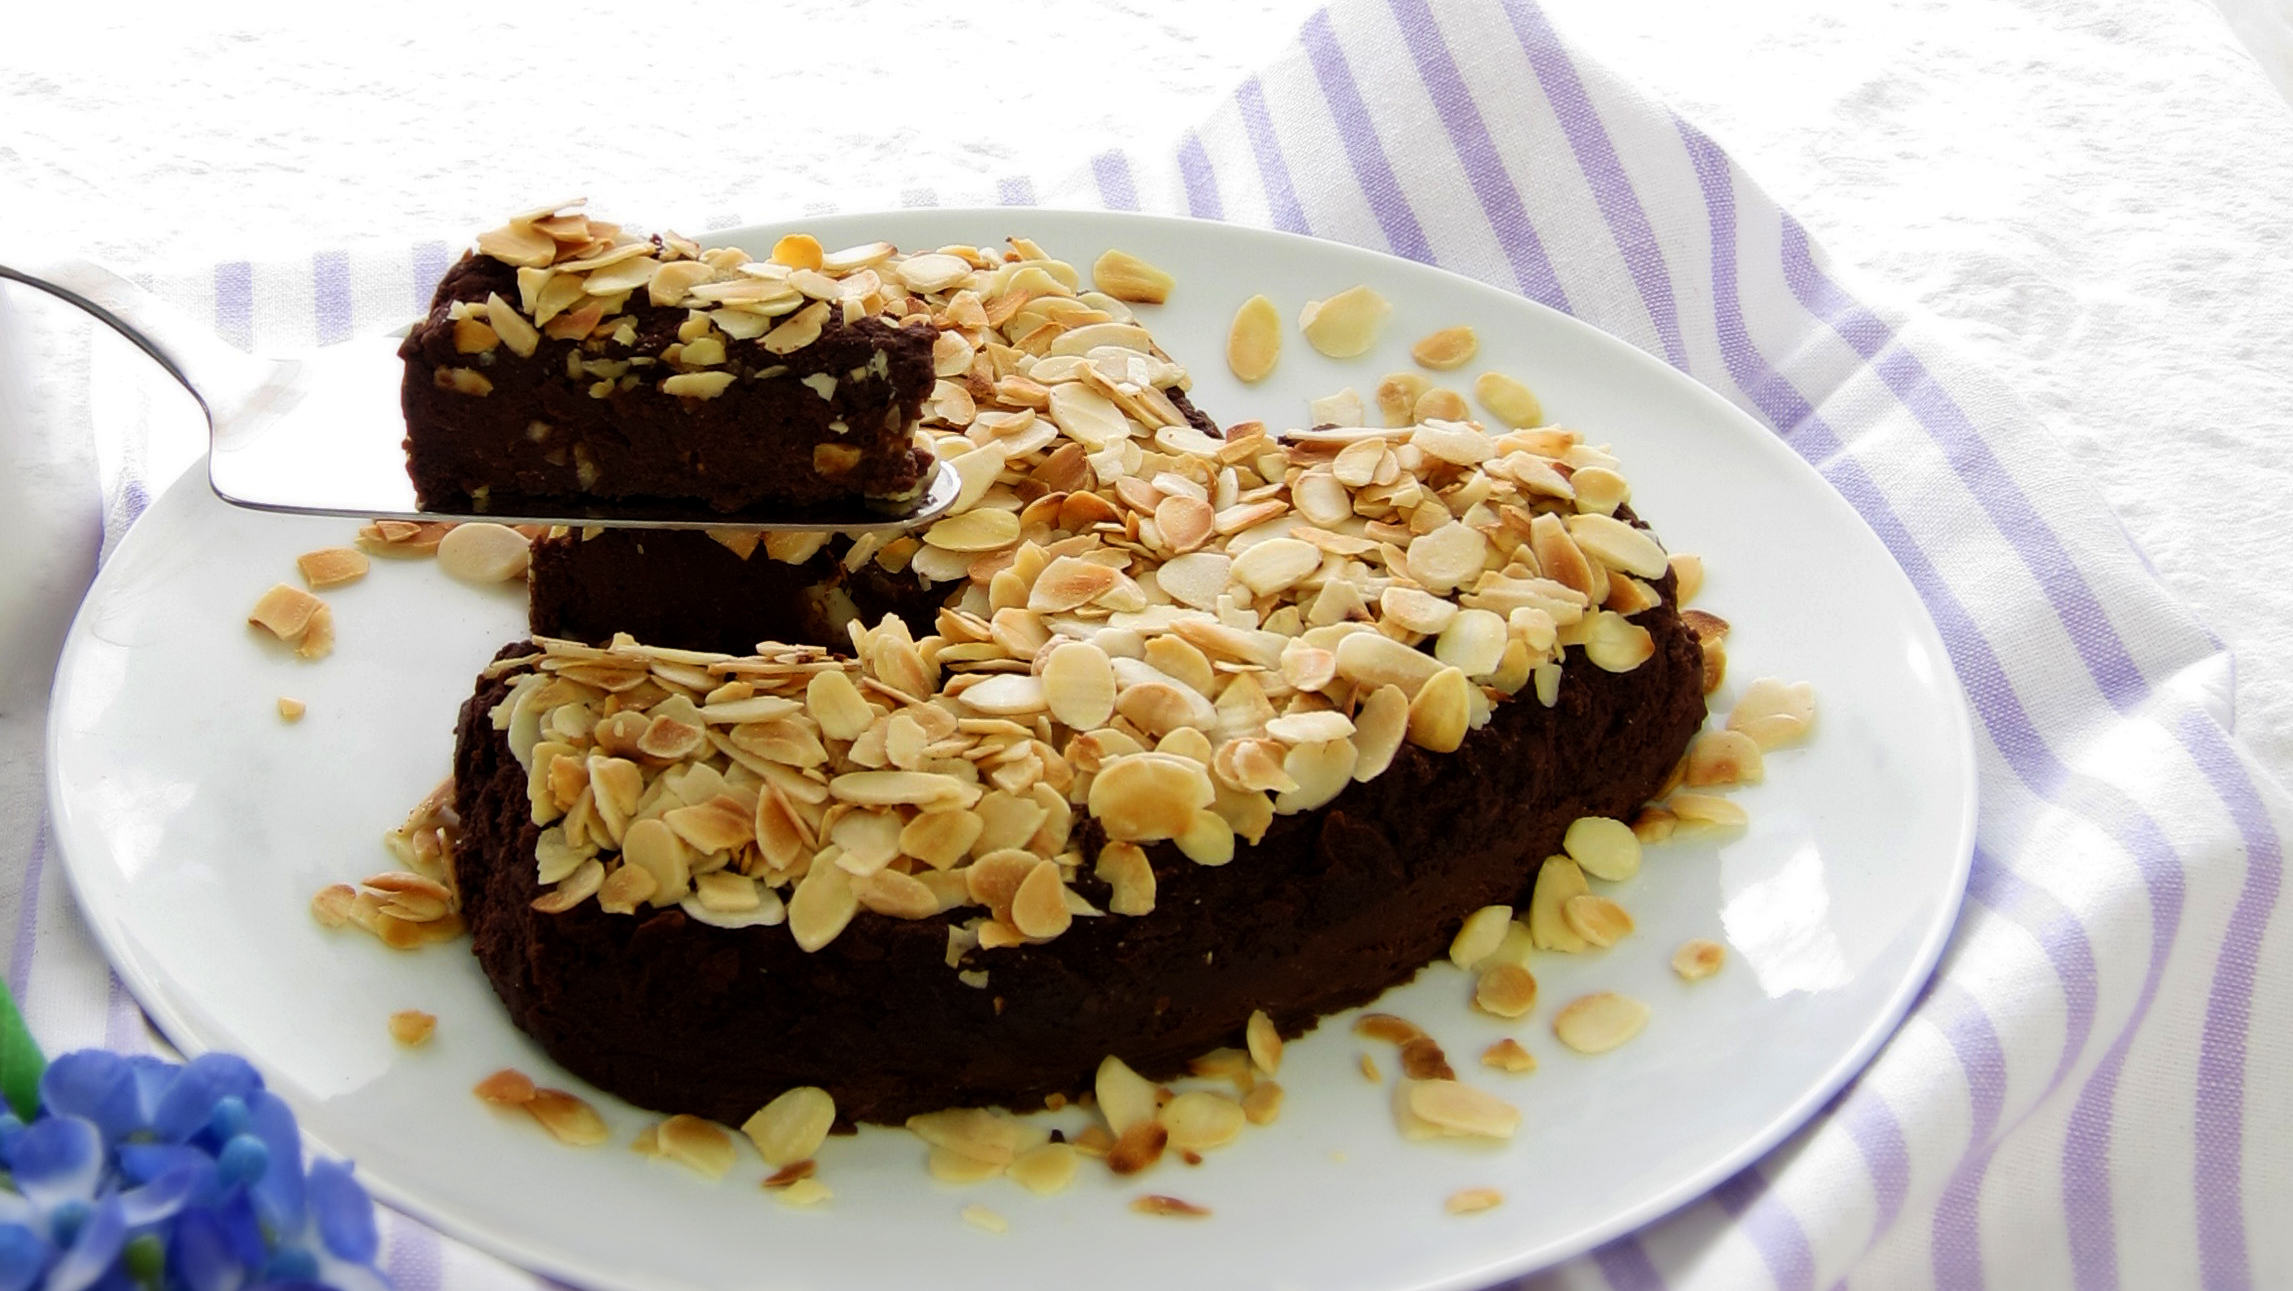 Borlotti Bean Brownie Cake For The Love Of Beans ⋆ Hip